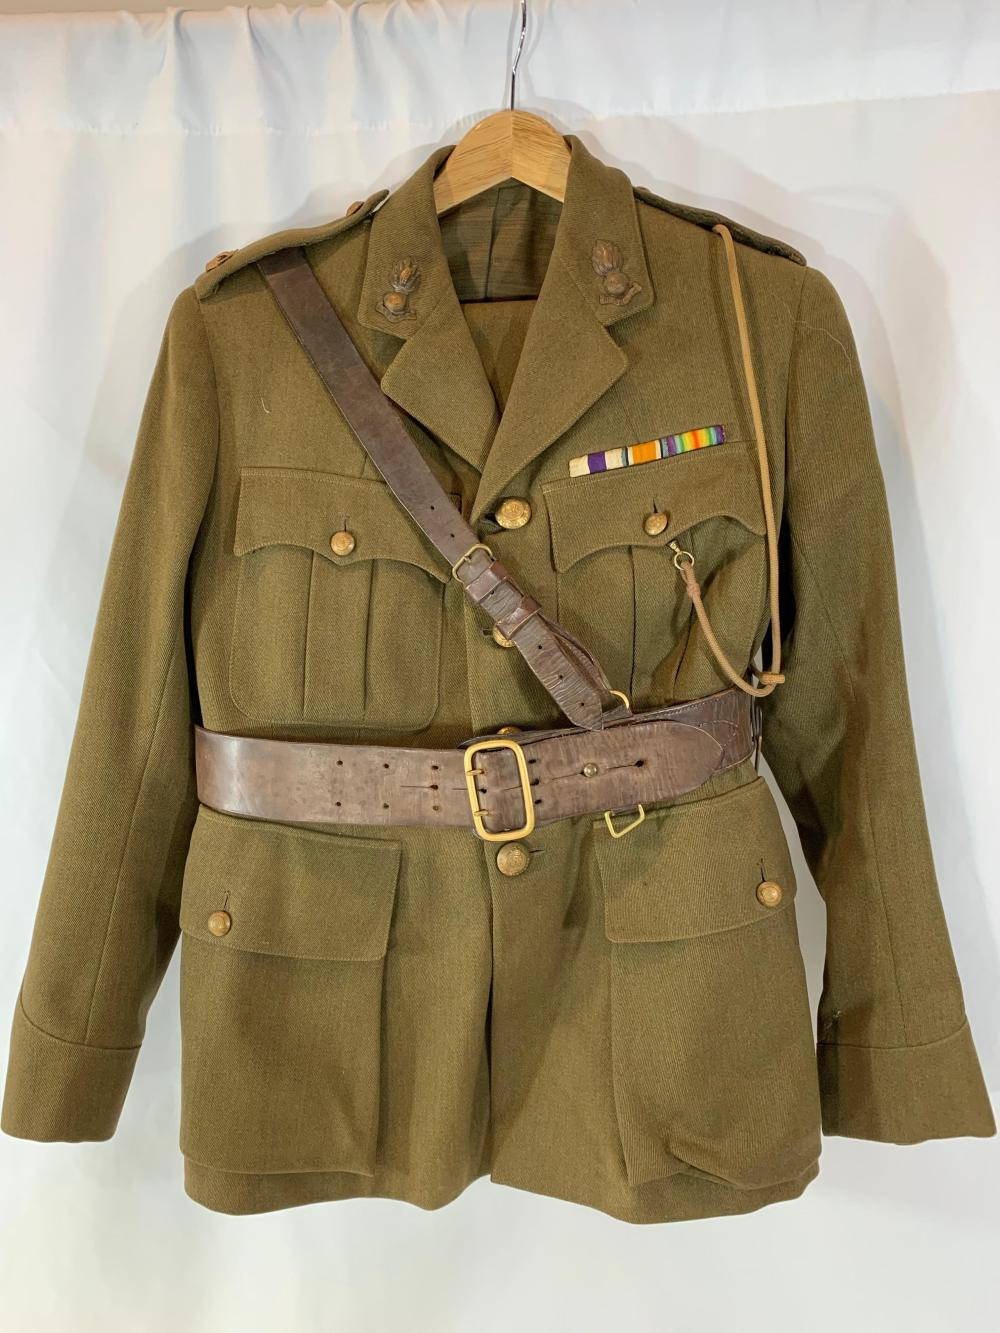 Military Cross Winner Royal Engineers Uniform